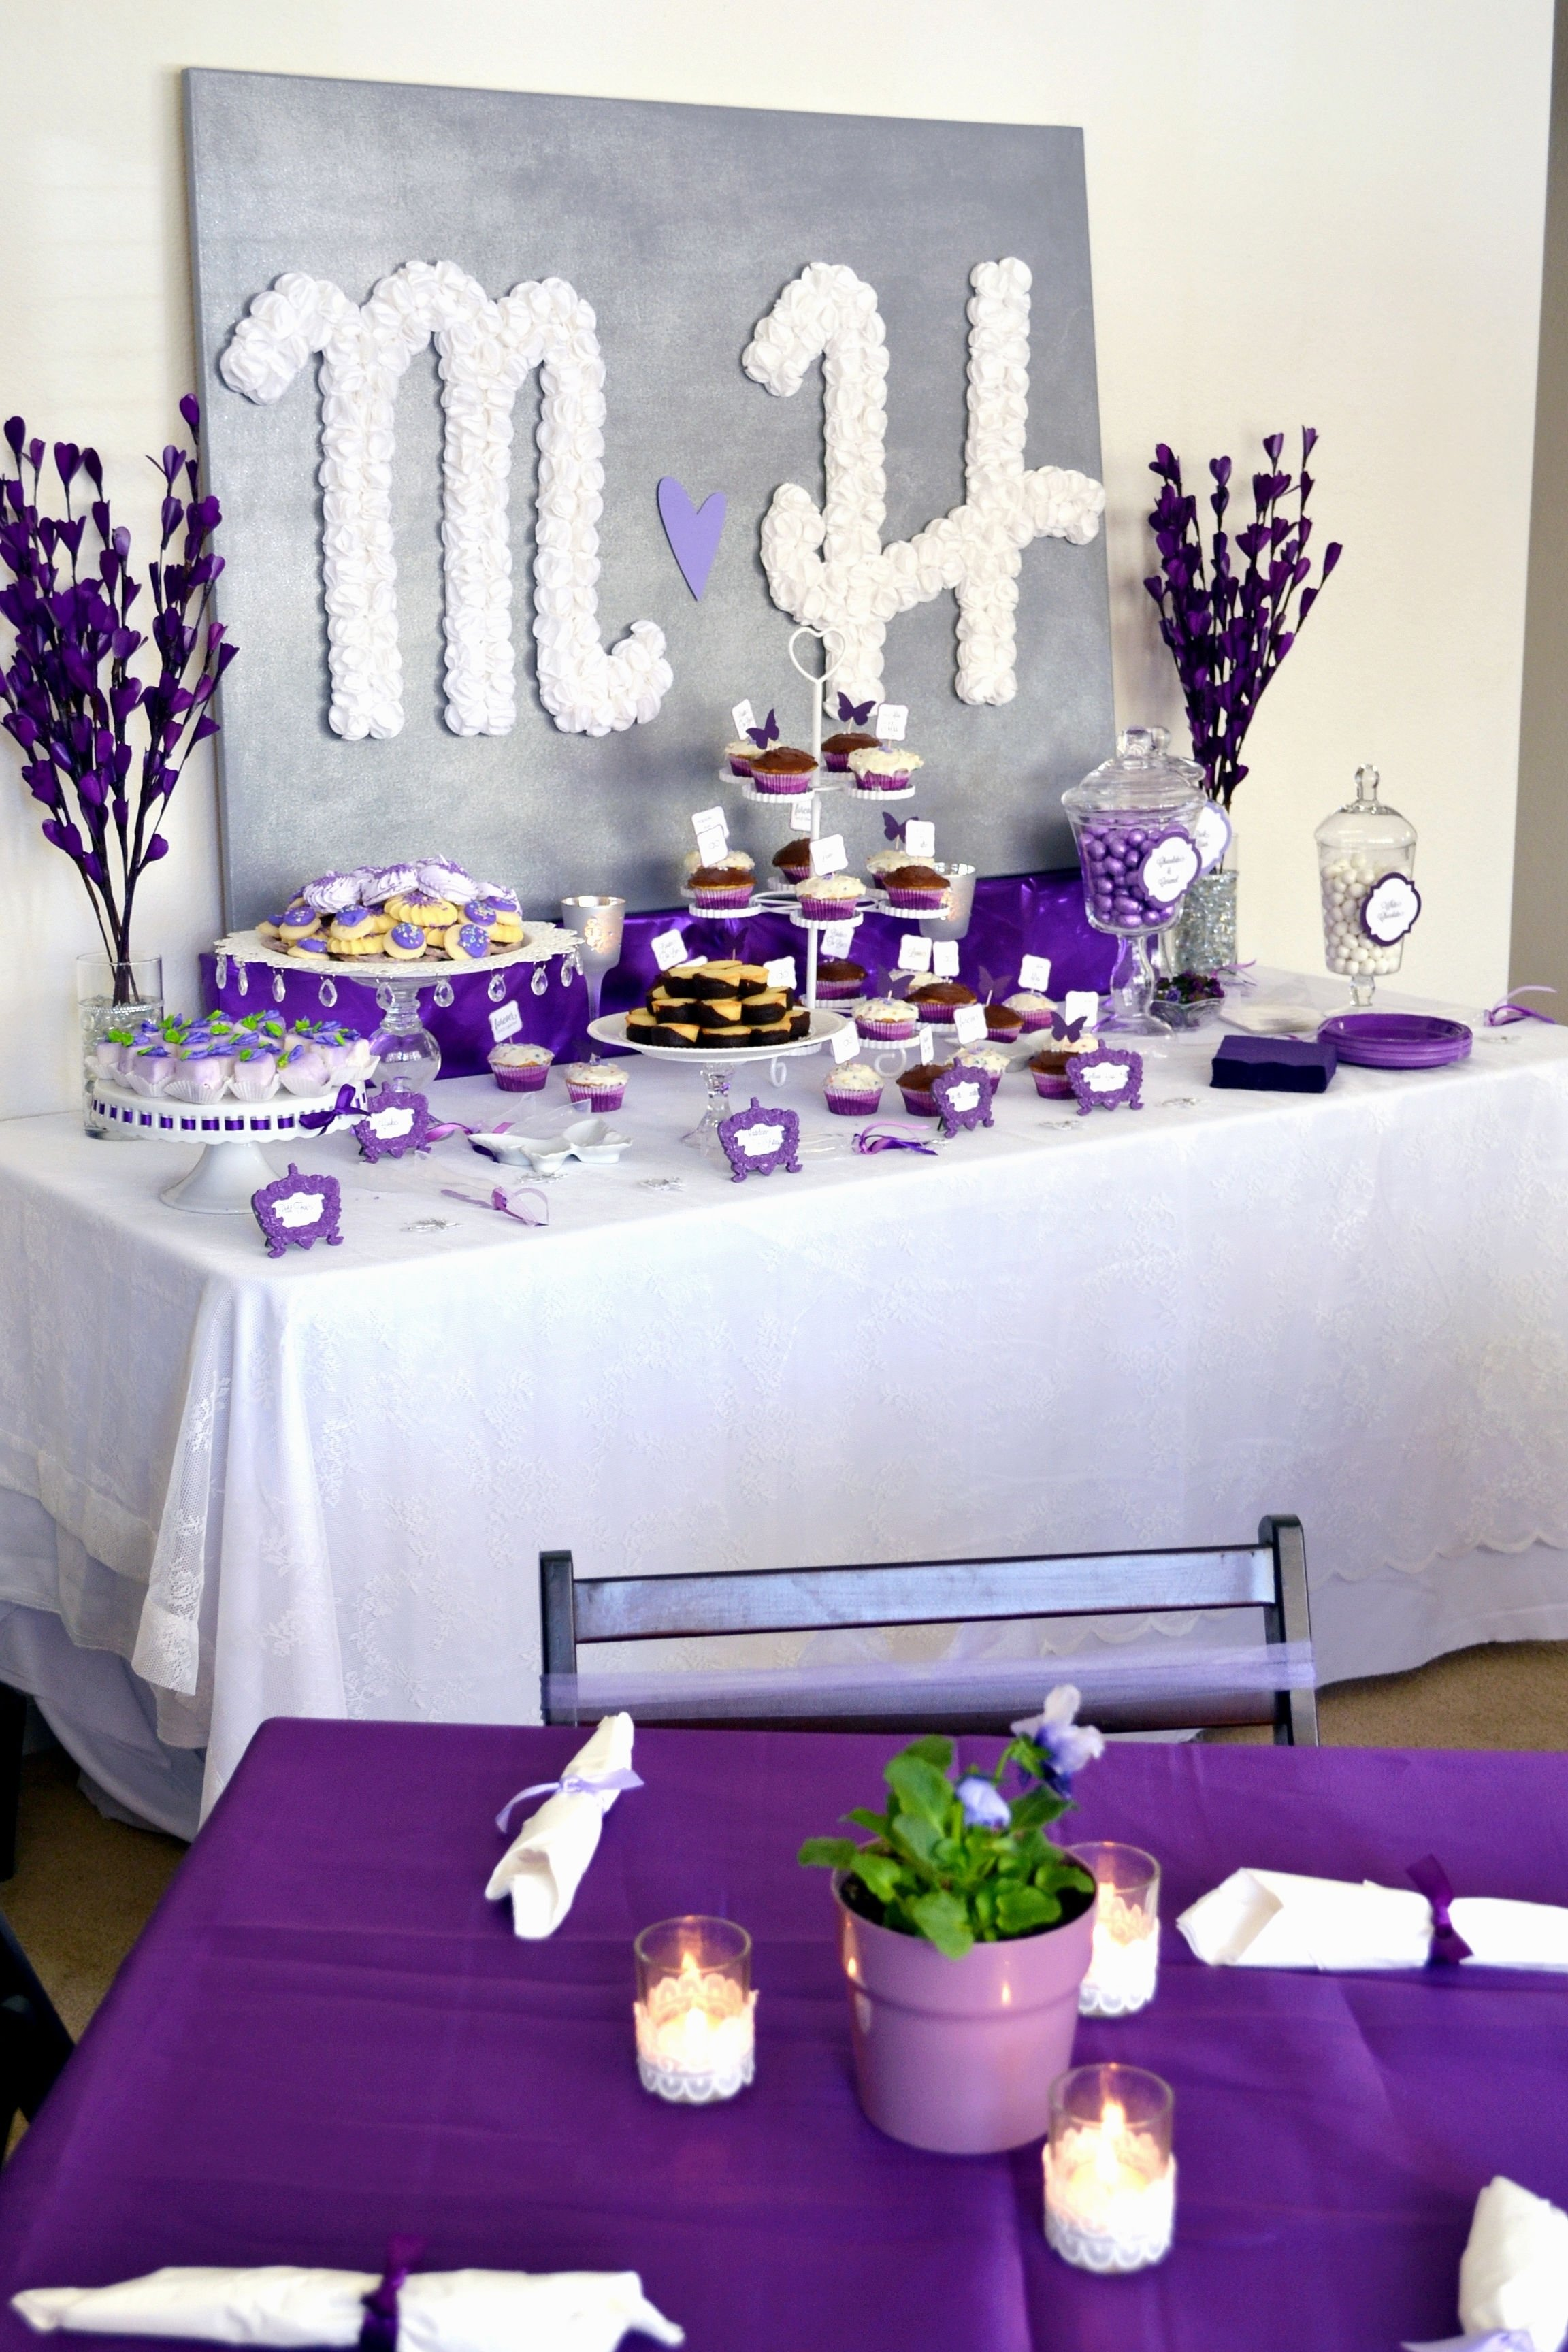 10 Most Popular Bridal Shower Decoration Ideas Homemade diy wedding shower decorations reception decoration ideas 2018